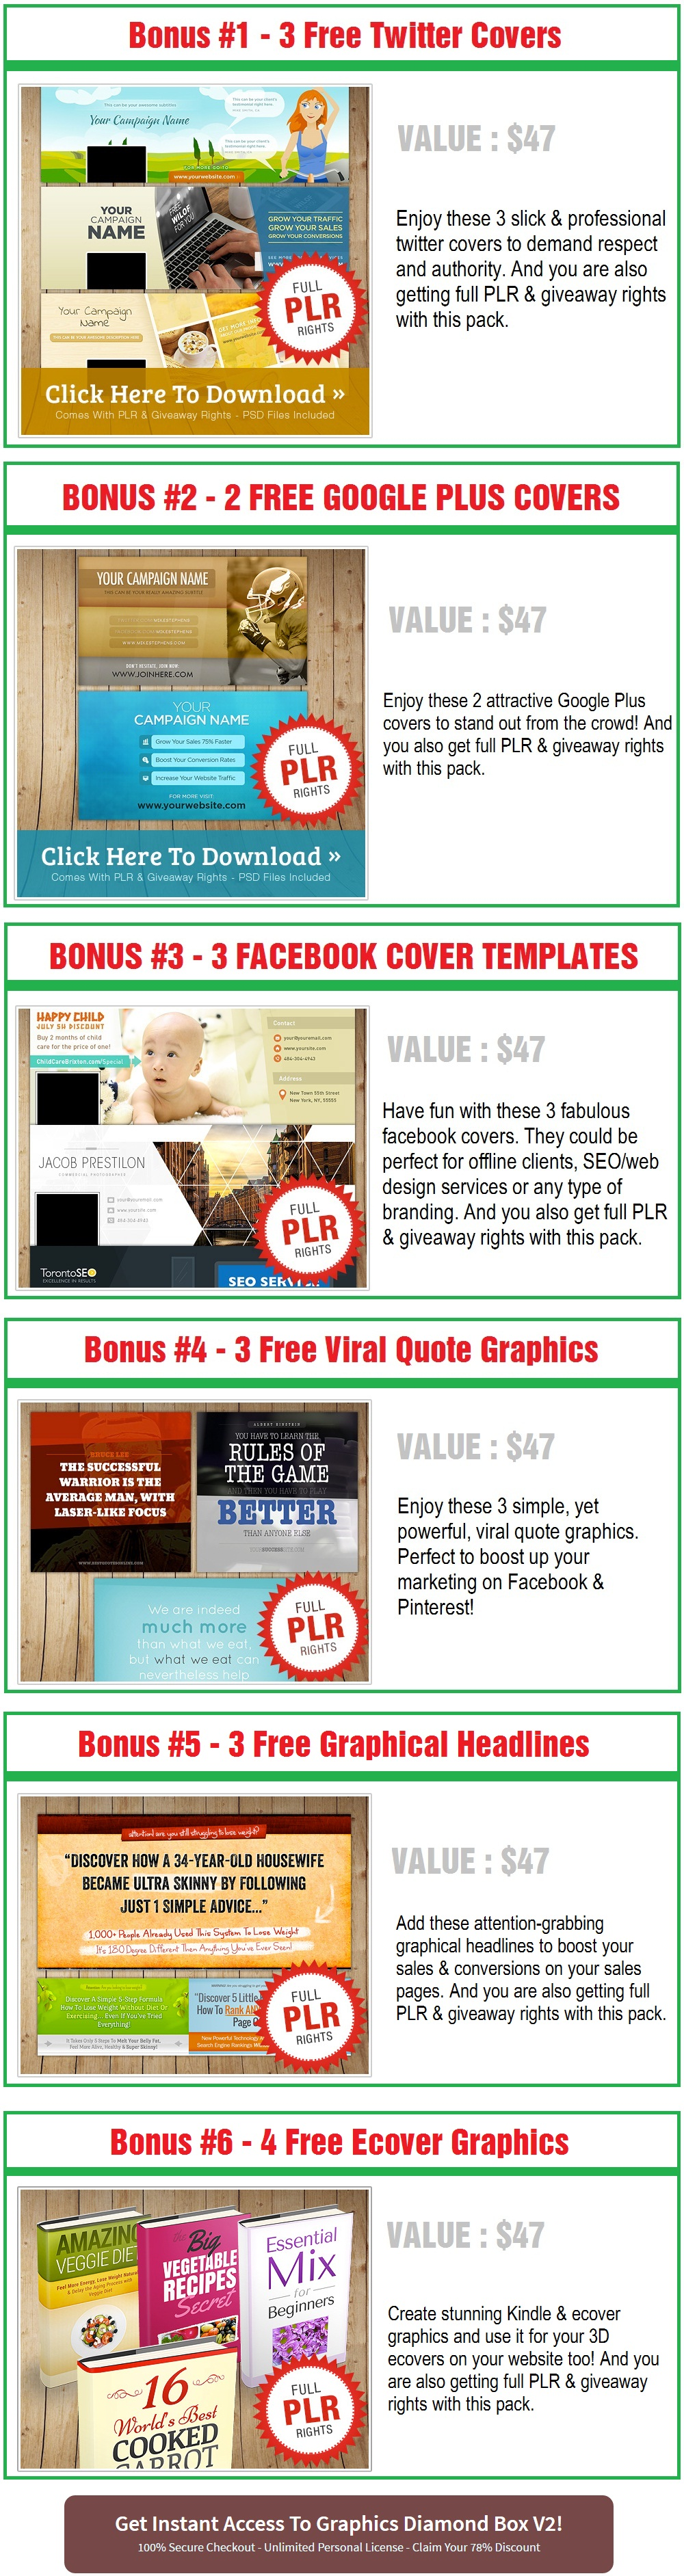 Graphics Diamond Box Bonus